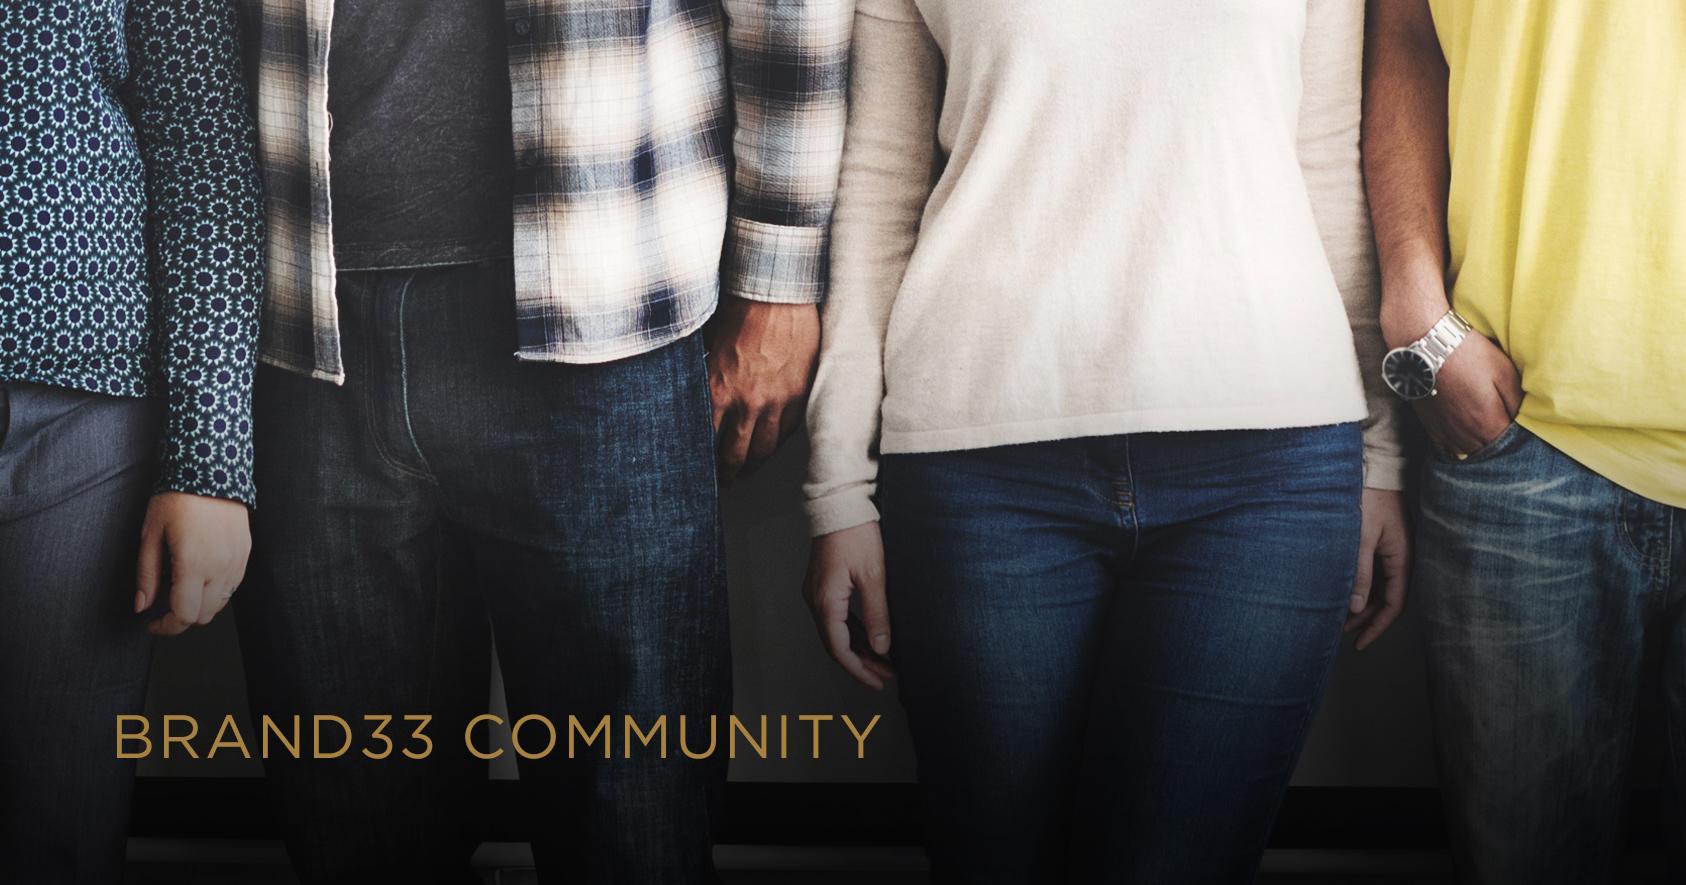 B33_Community.jpg